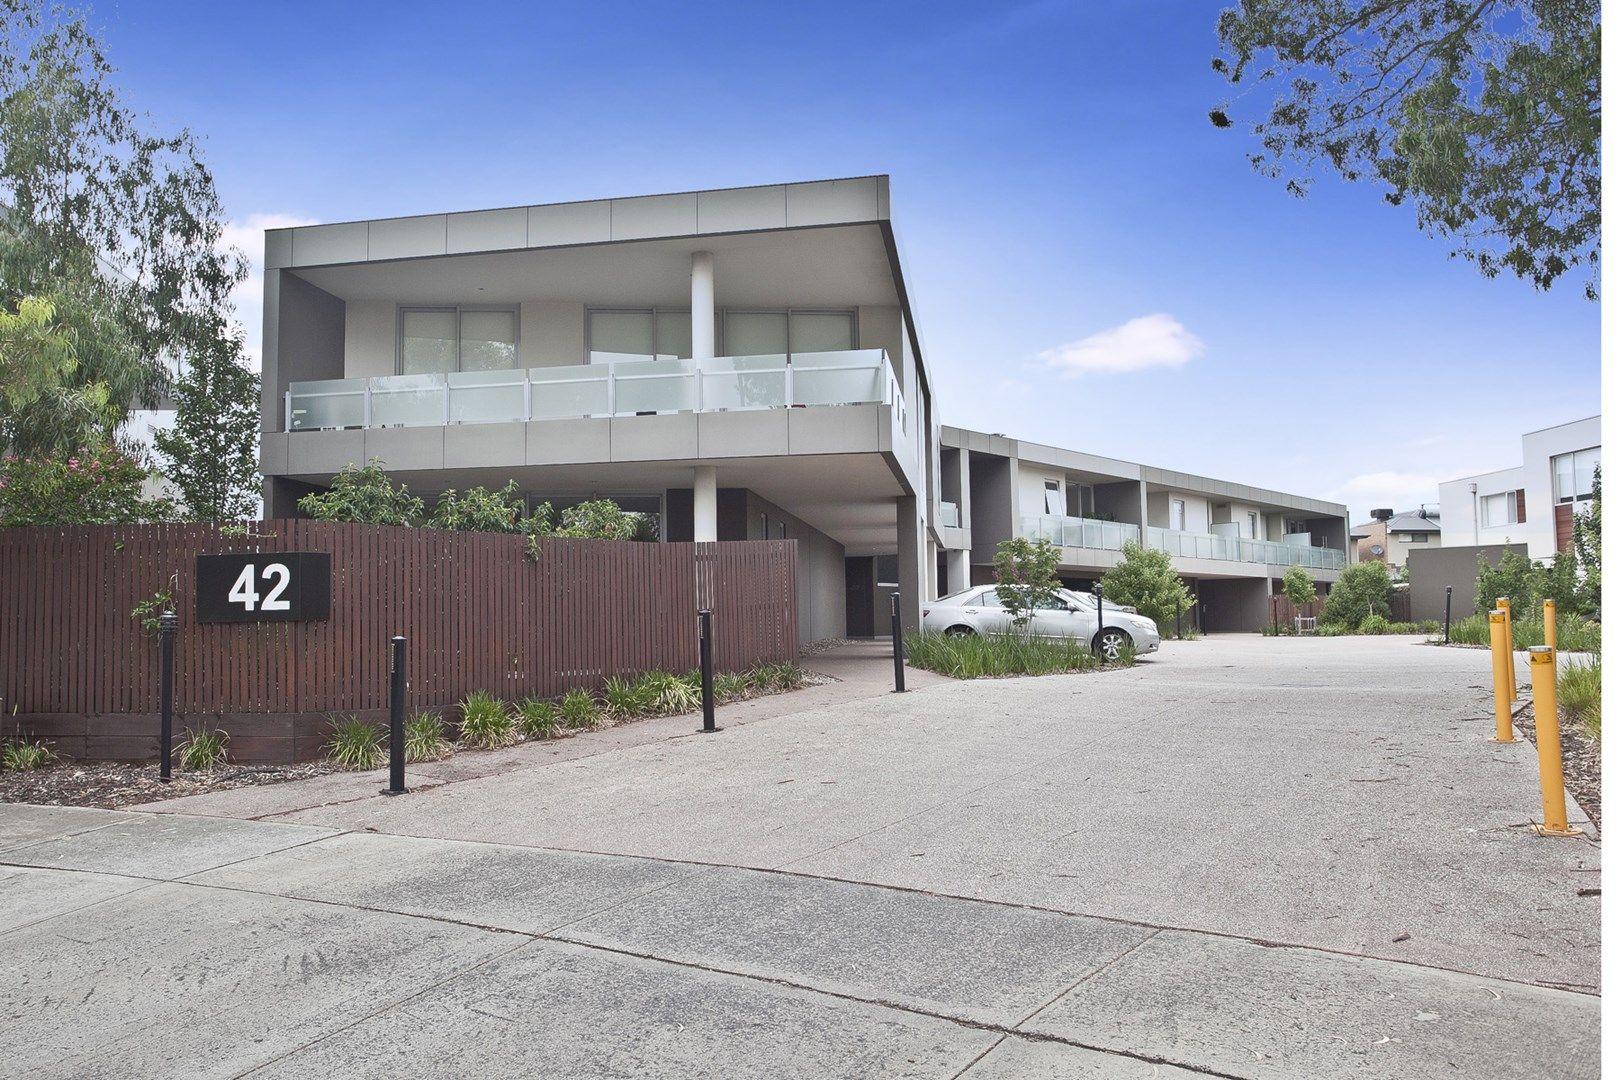 2/42 Eucalyptus Drive, Maidstone VIC 3012, Image 0